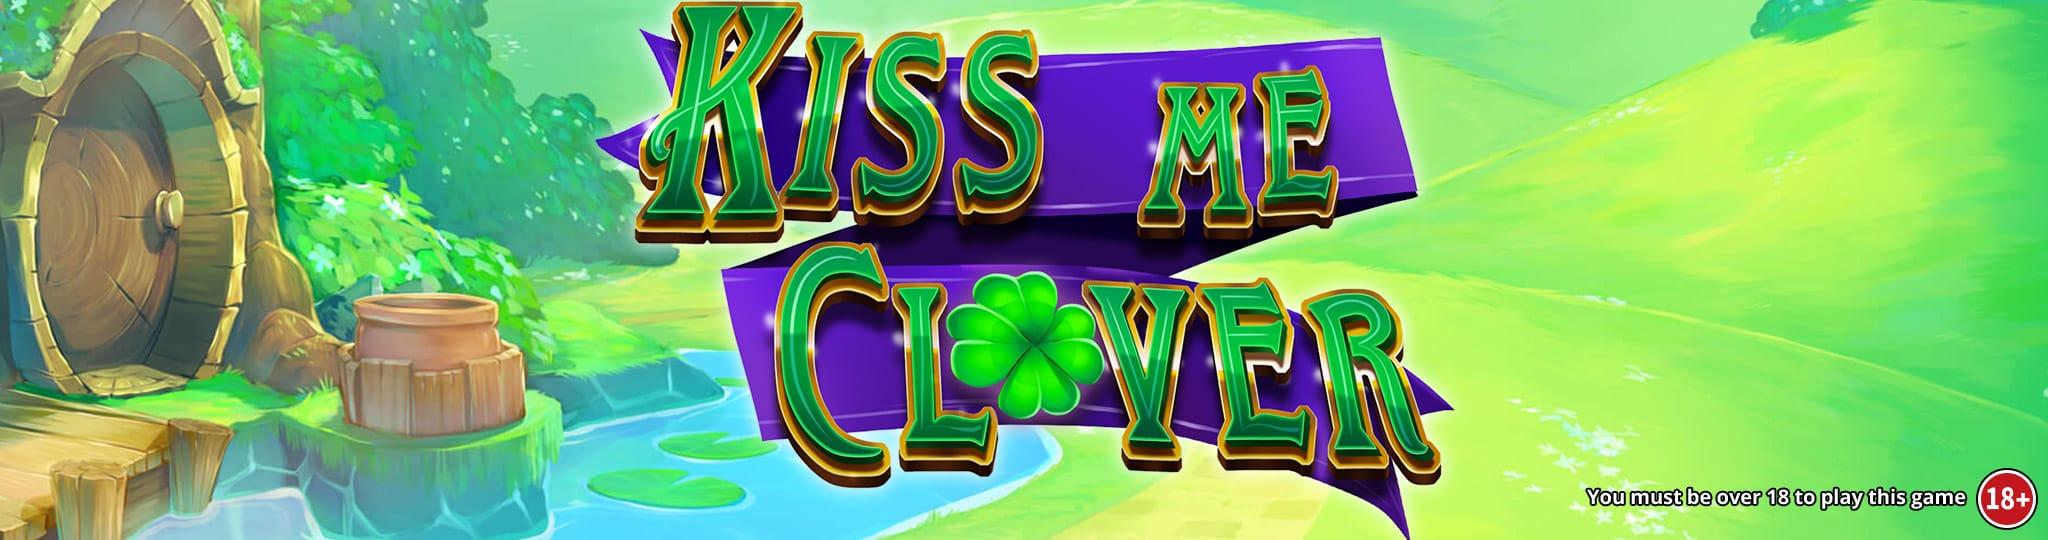 kiss me clover jackpot slots game logo